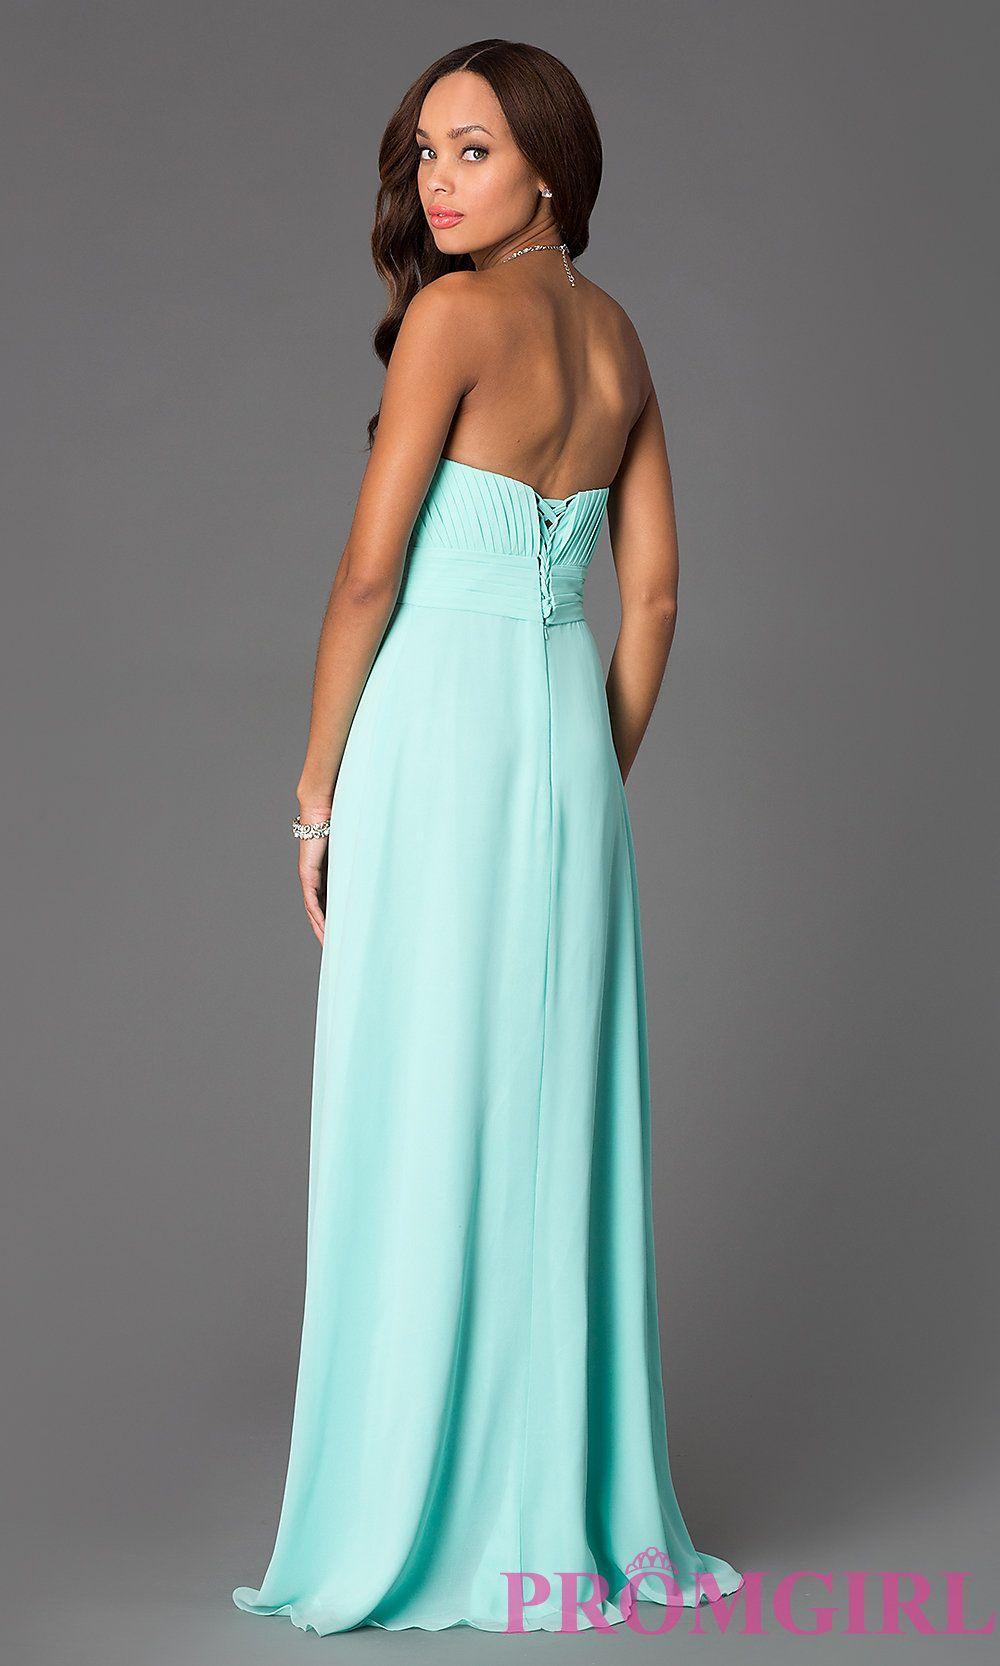 Long Strapless Empire Waist Prom Dress | Formal dresses, Formal ...